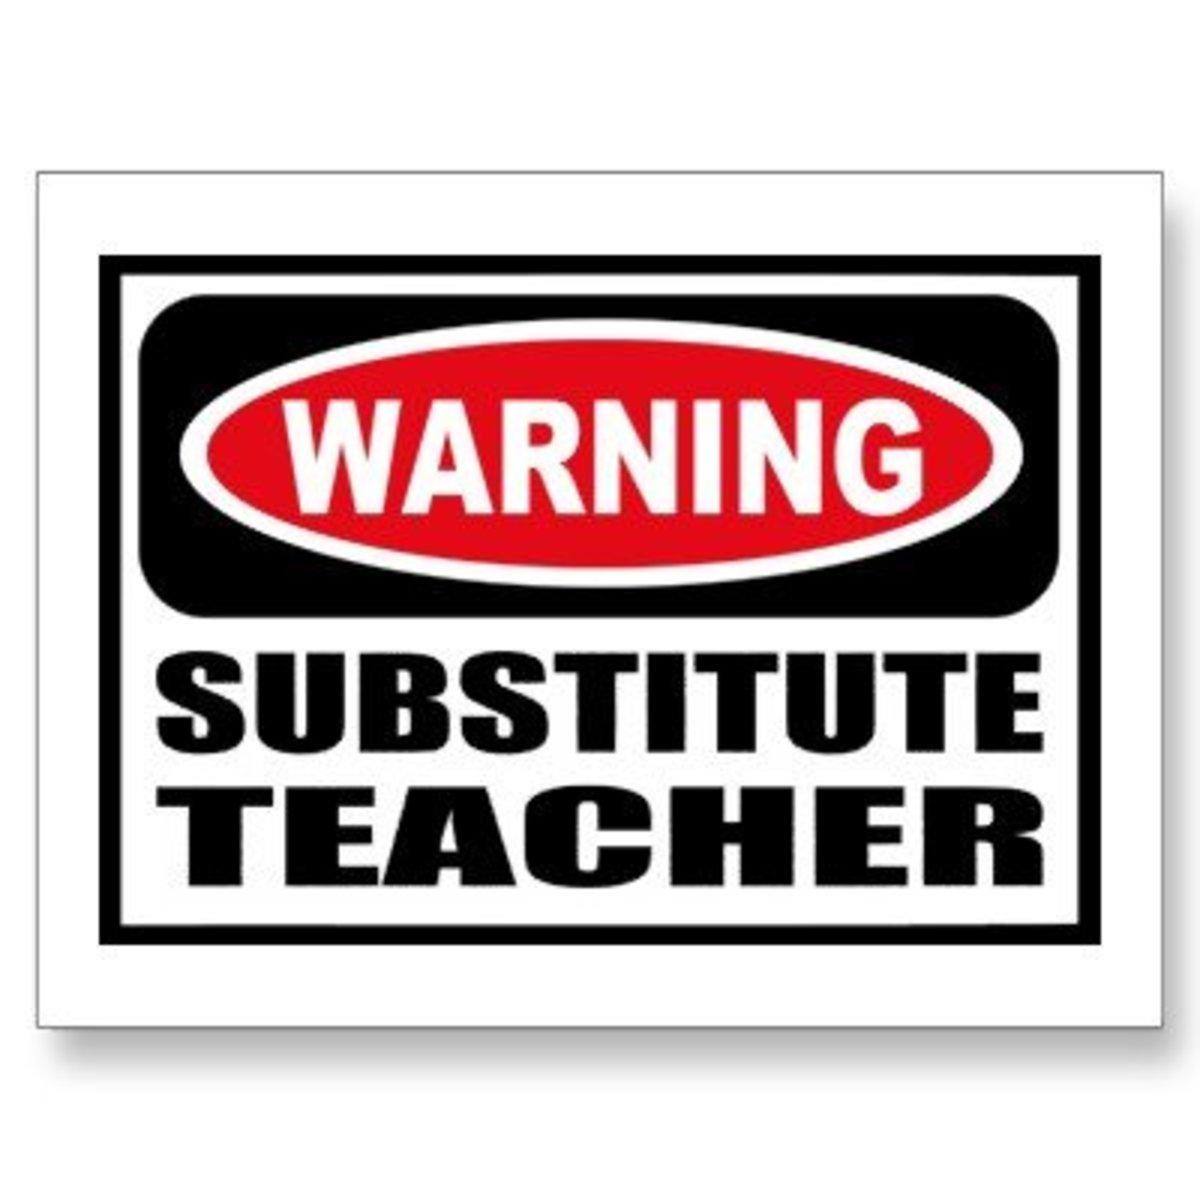 10-tips-to-get-through-a-day-as-a-substitute-teacher